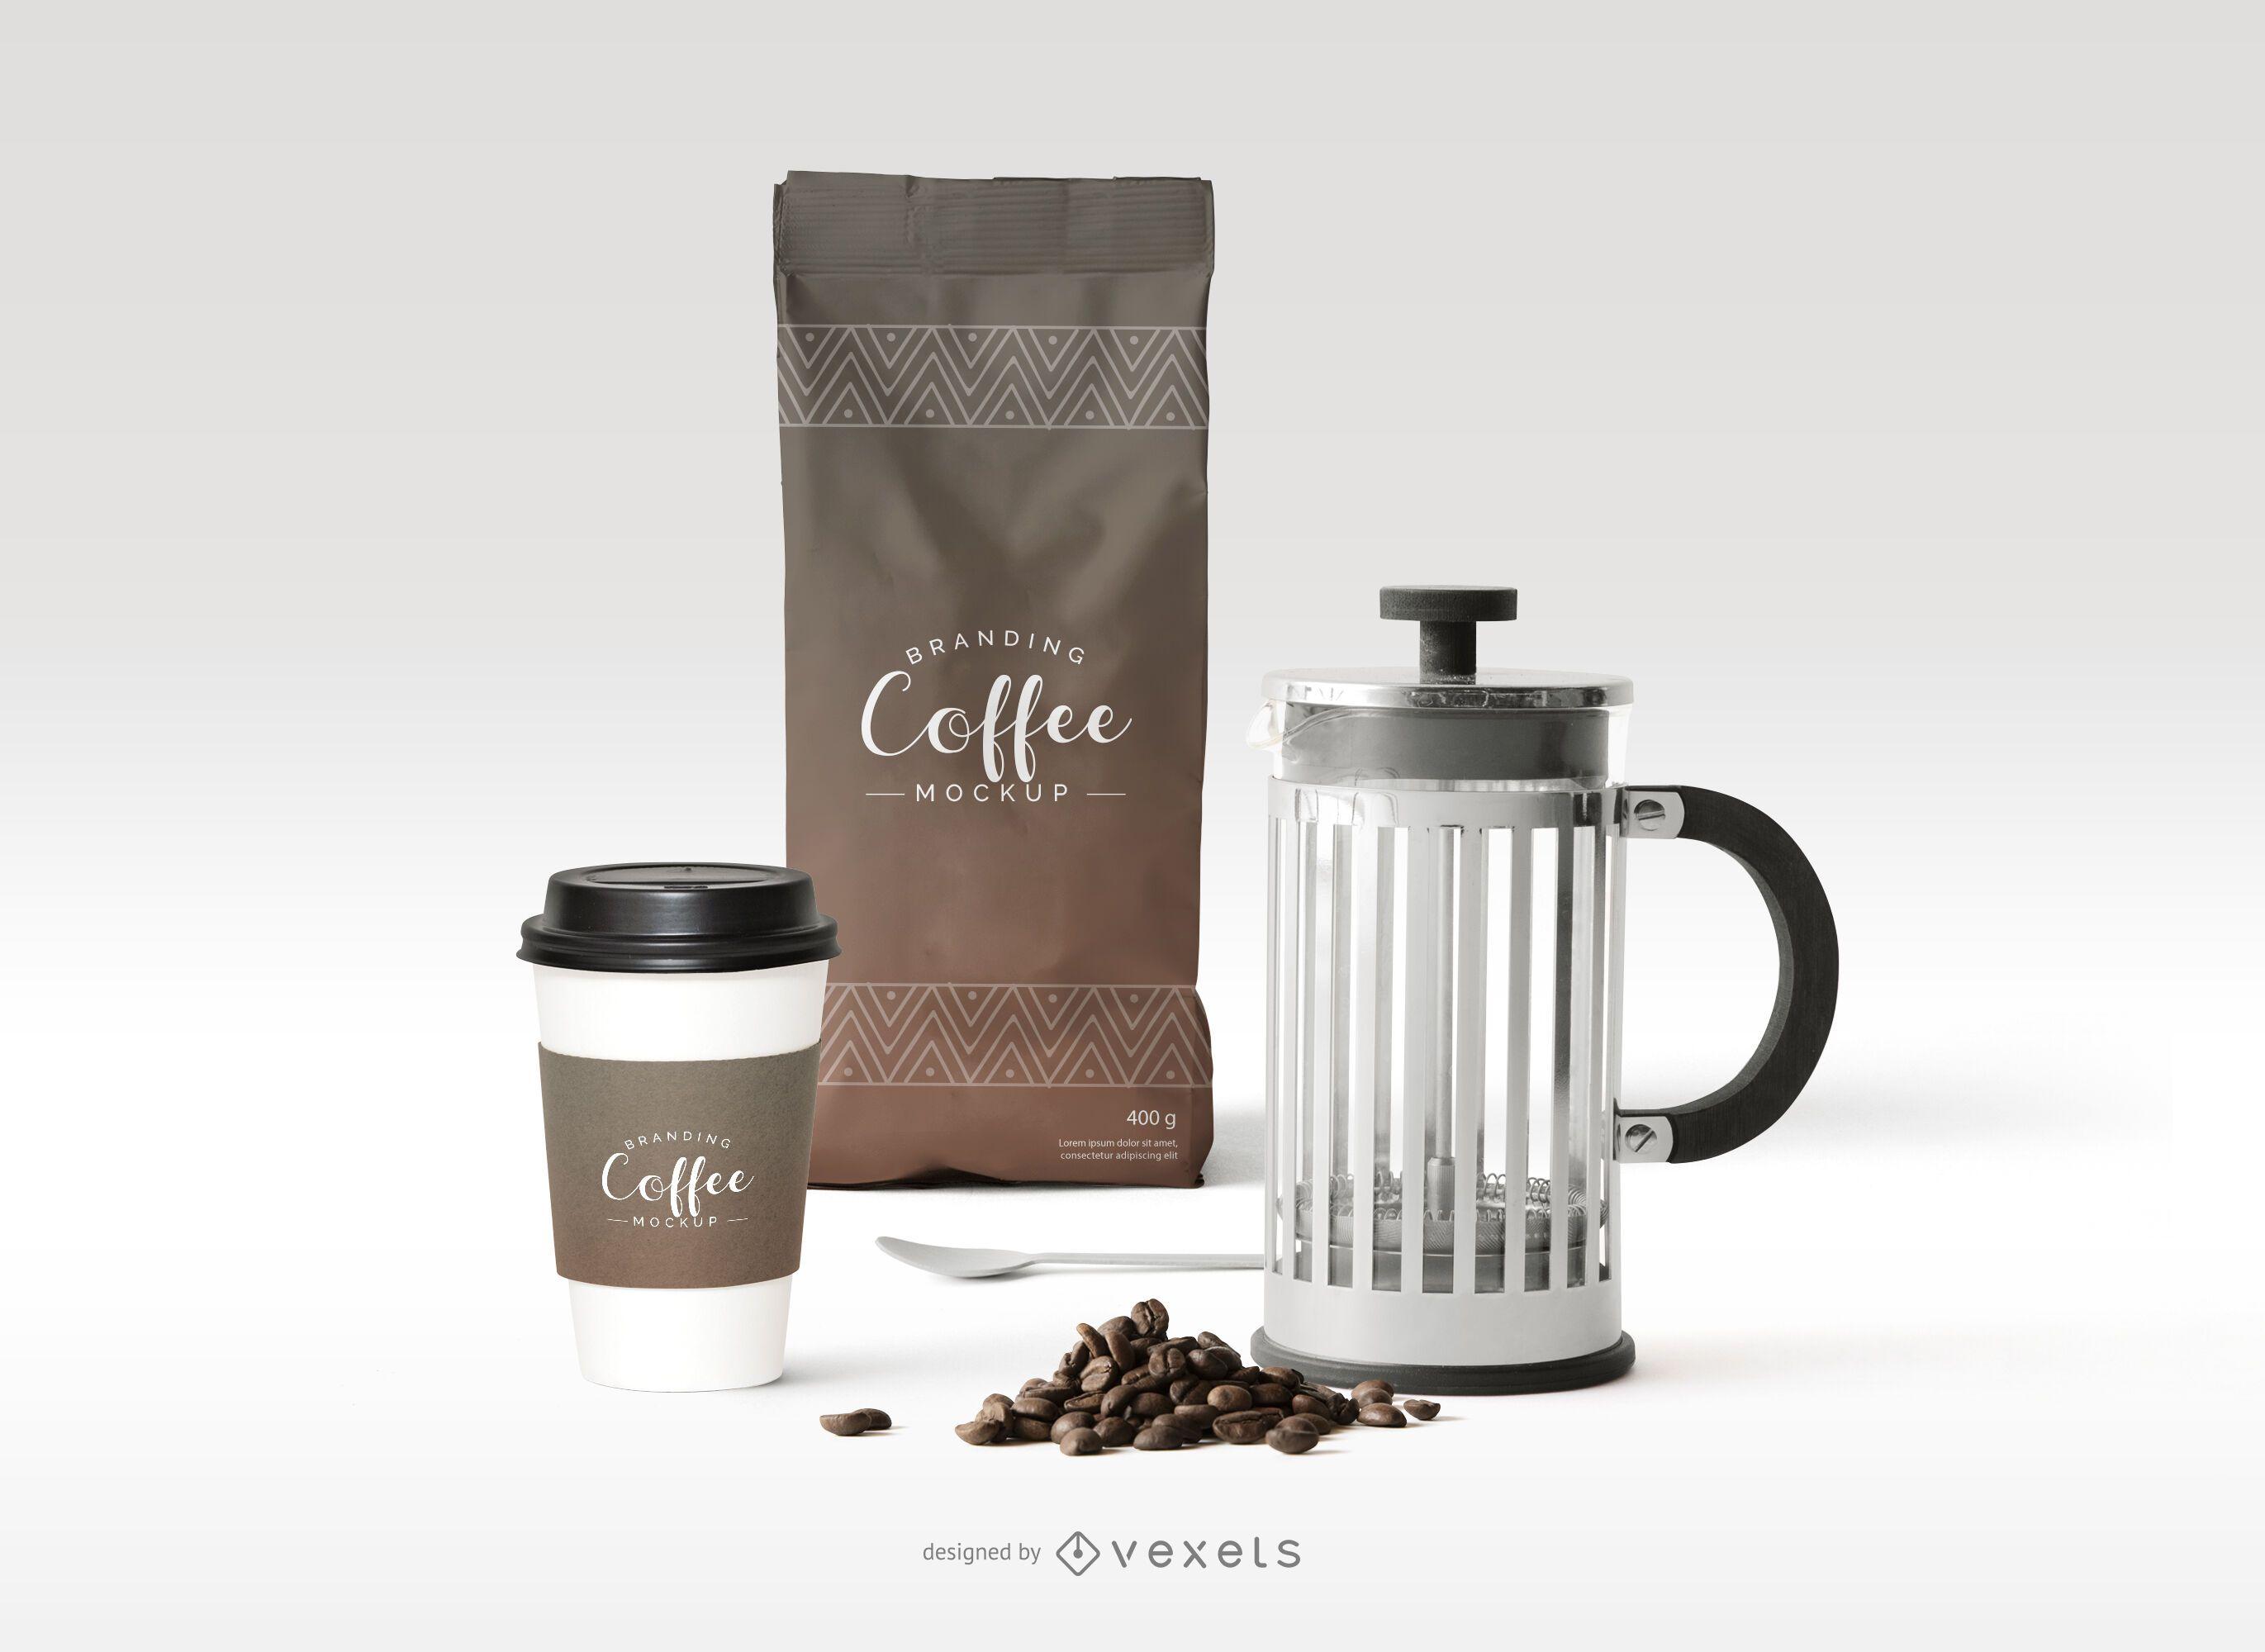 Coffee branding mockup composition